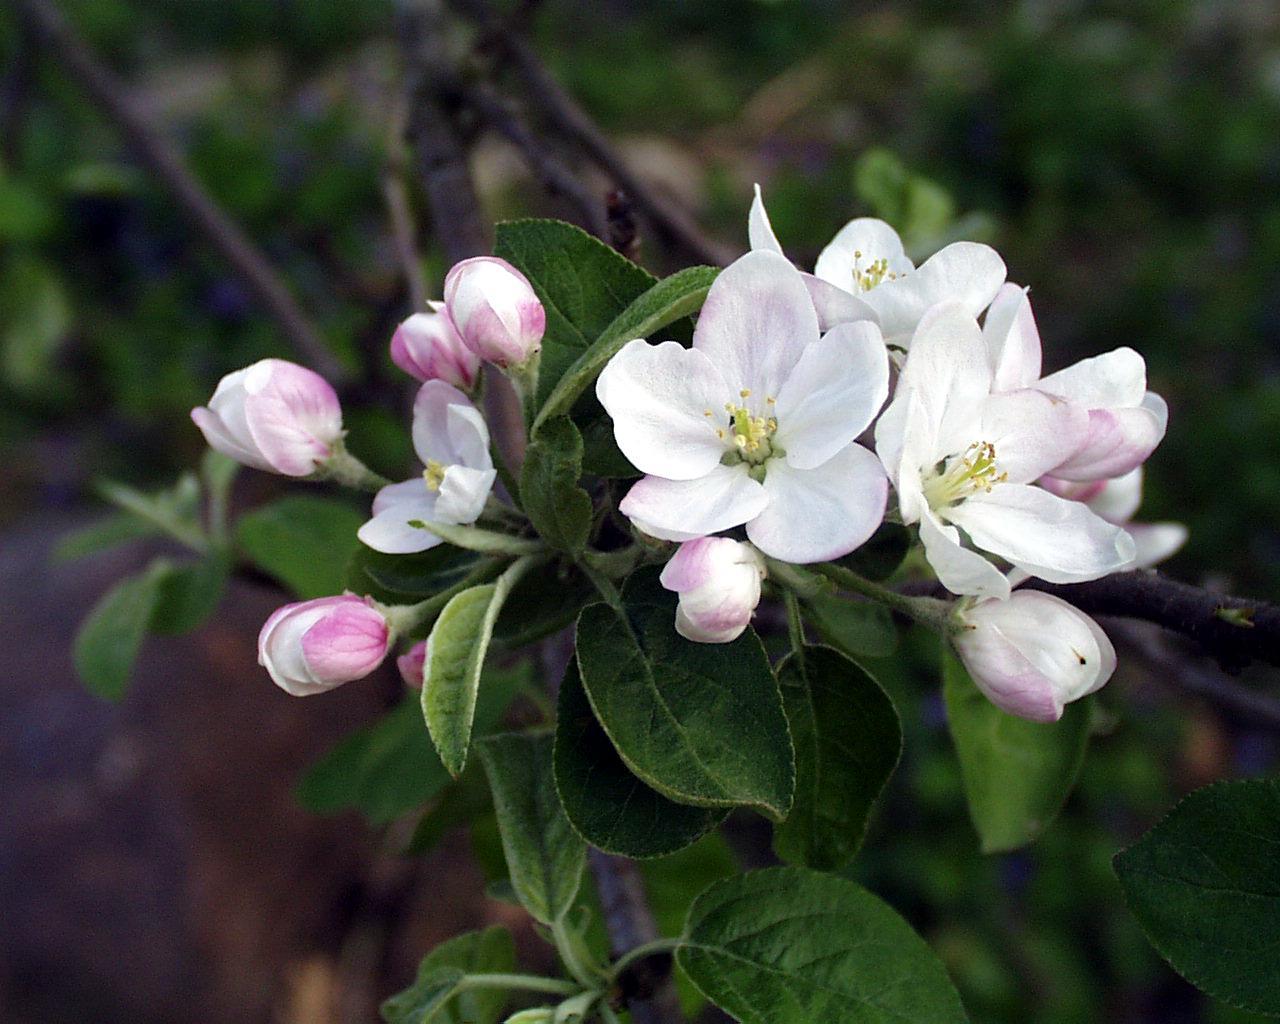 Malus domestica flowers